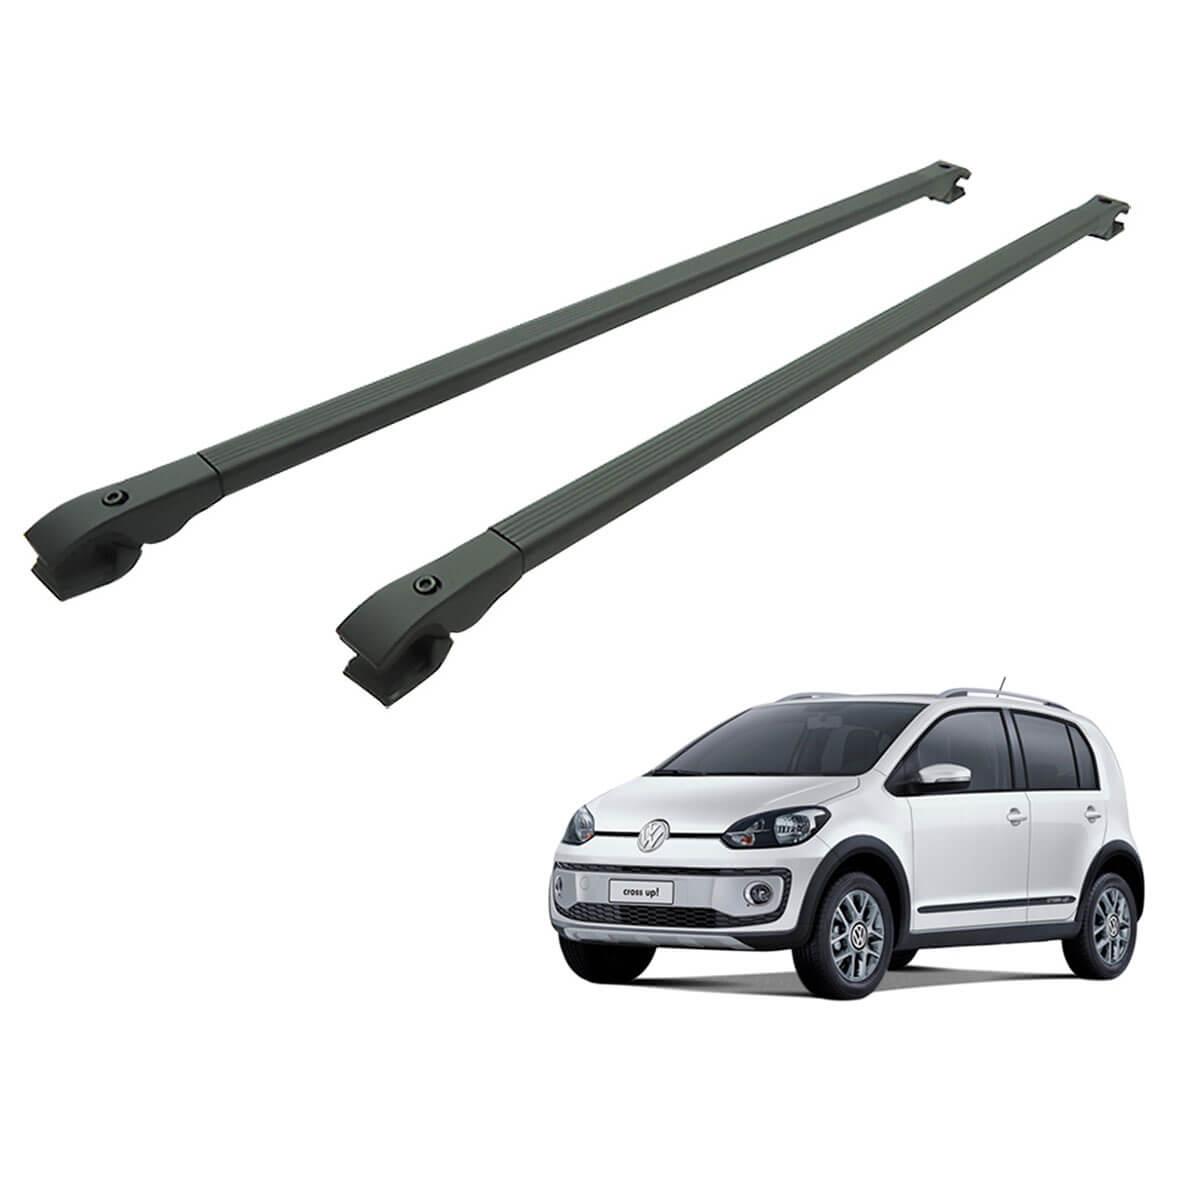 Travessa rack de teto alumínio preta UP! Cross VW up 2014 a 2017